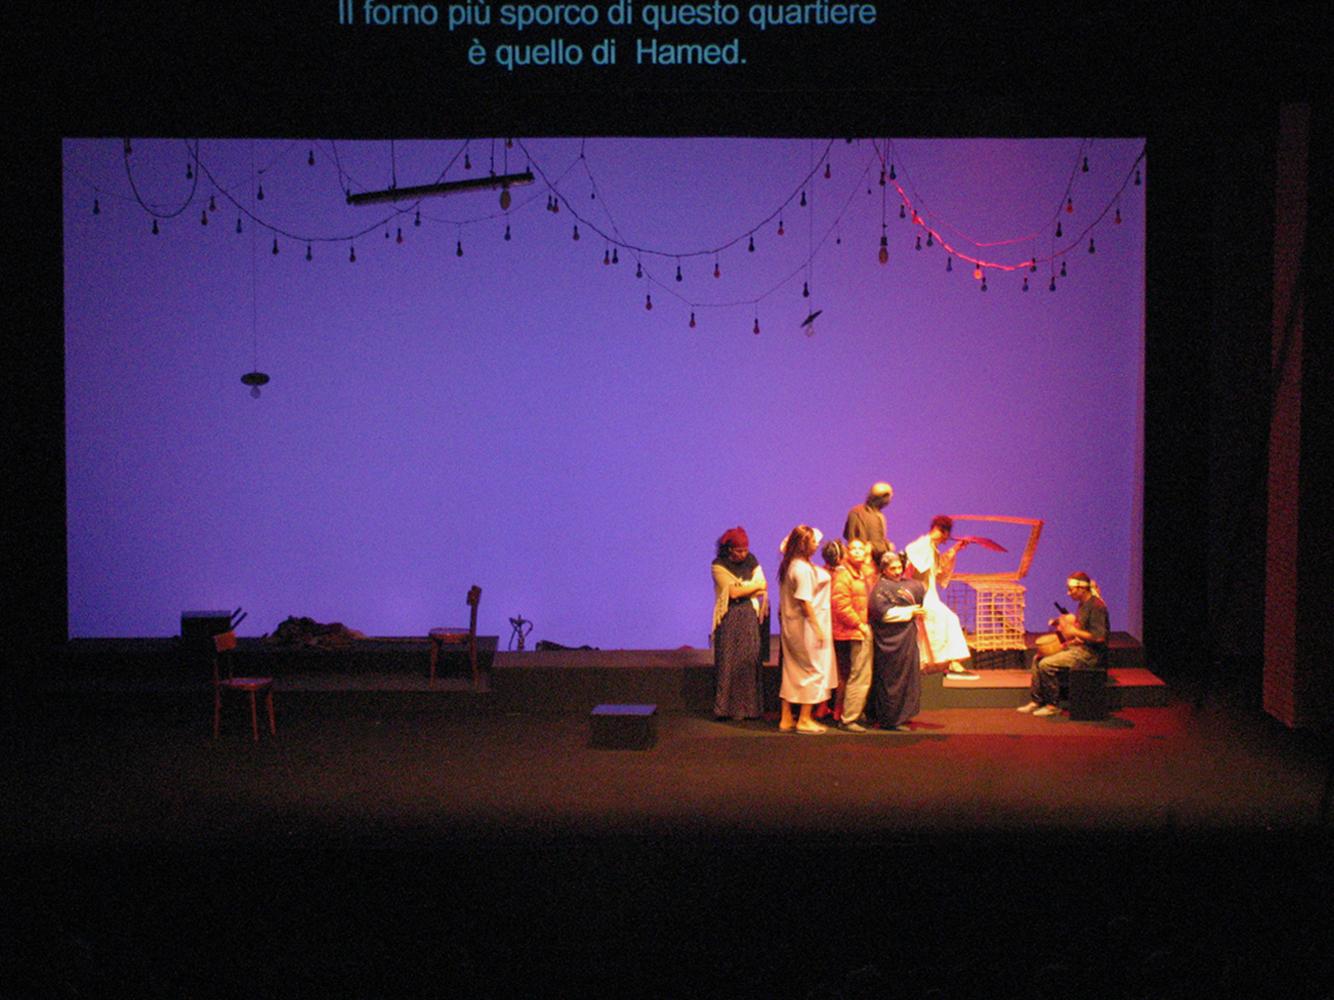 27 nov 2004 'Cairo in Tasca' au Piccolo Teatro Milano. Mise nen scène Hassan el-Geretly